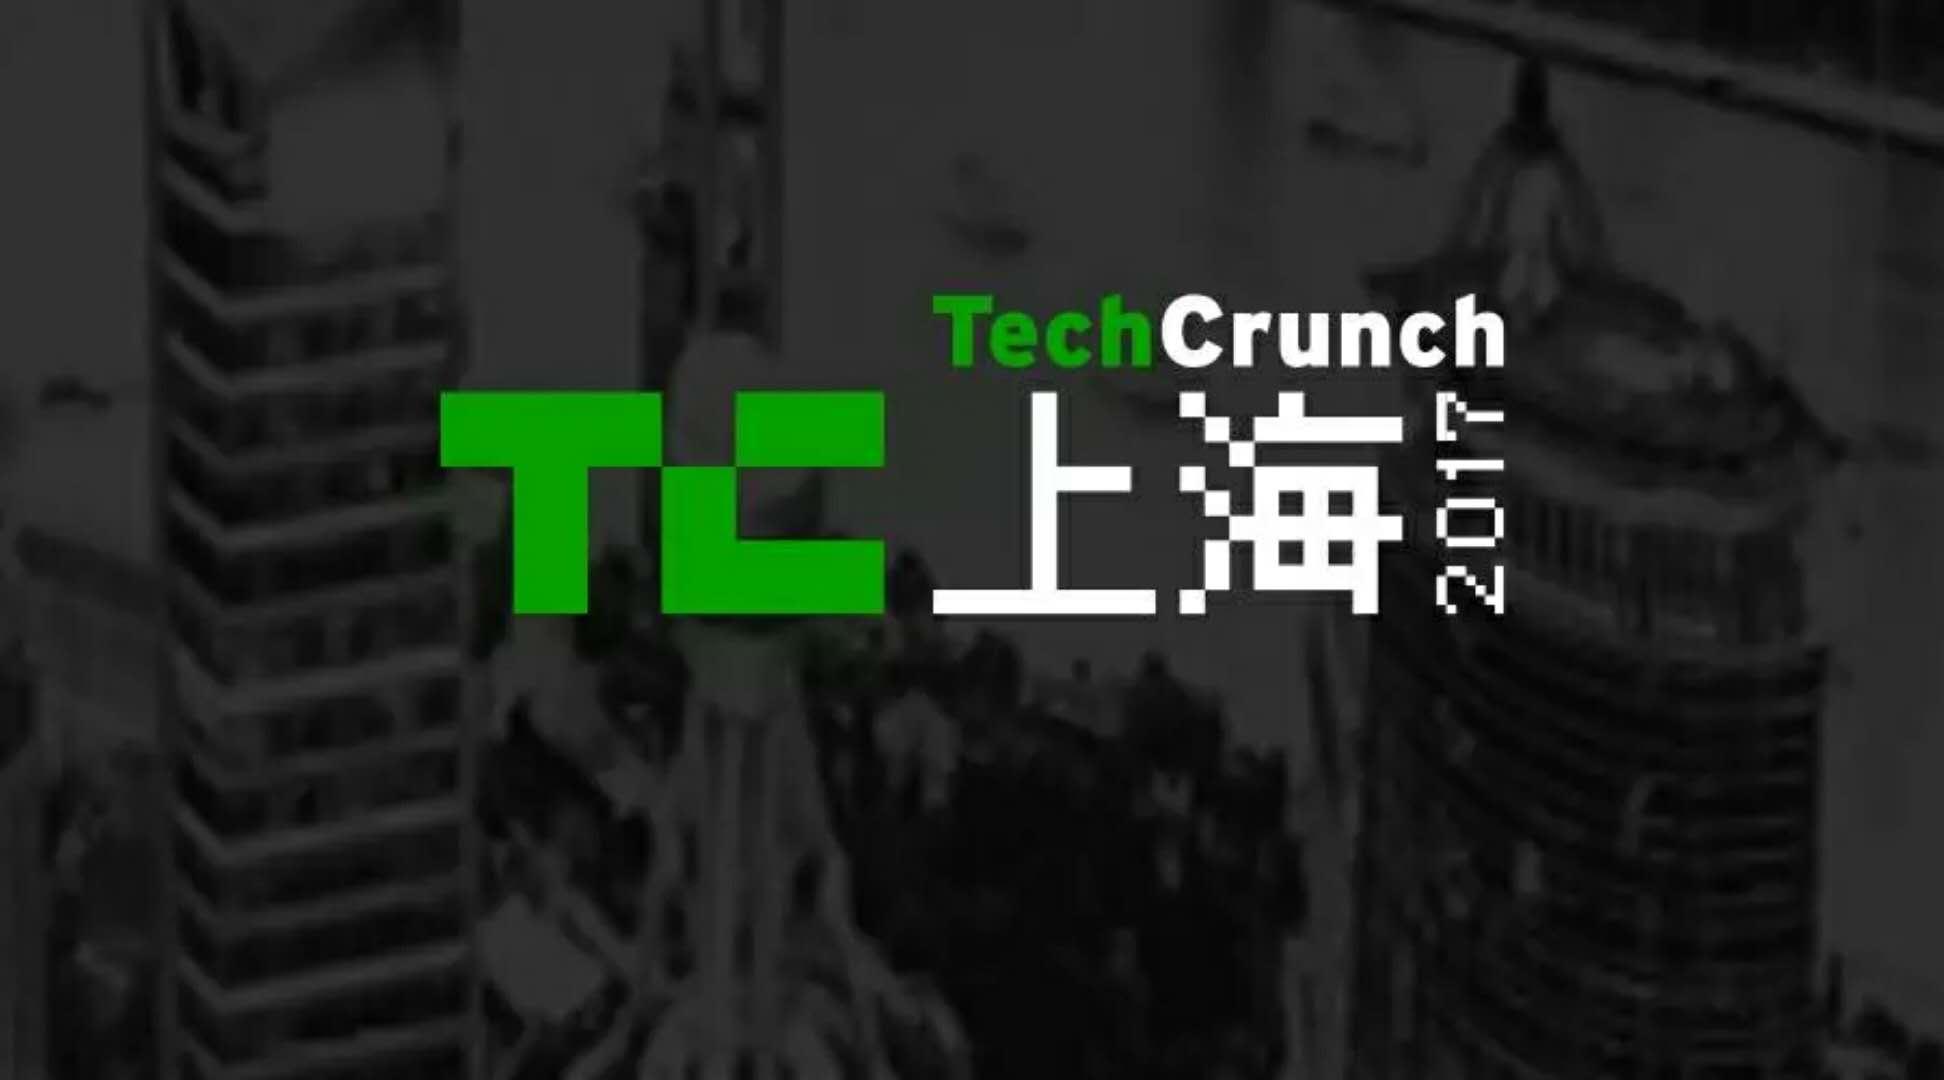 TechCrunch 国际创新峰会 2017 | 参会全攻略